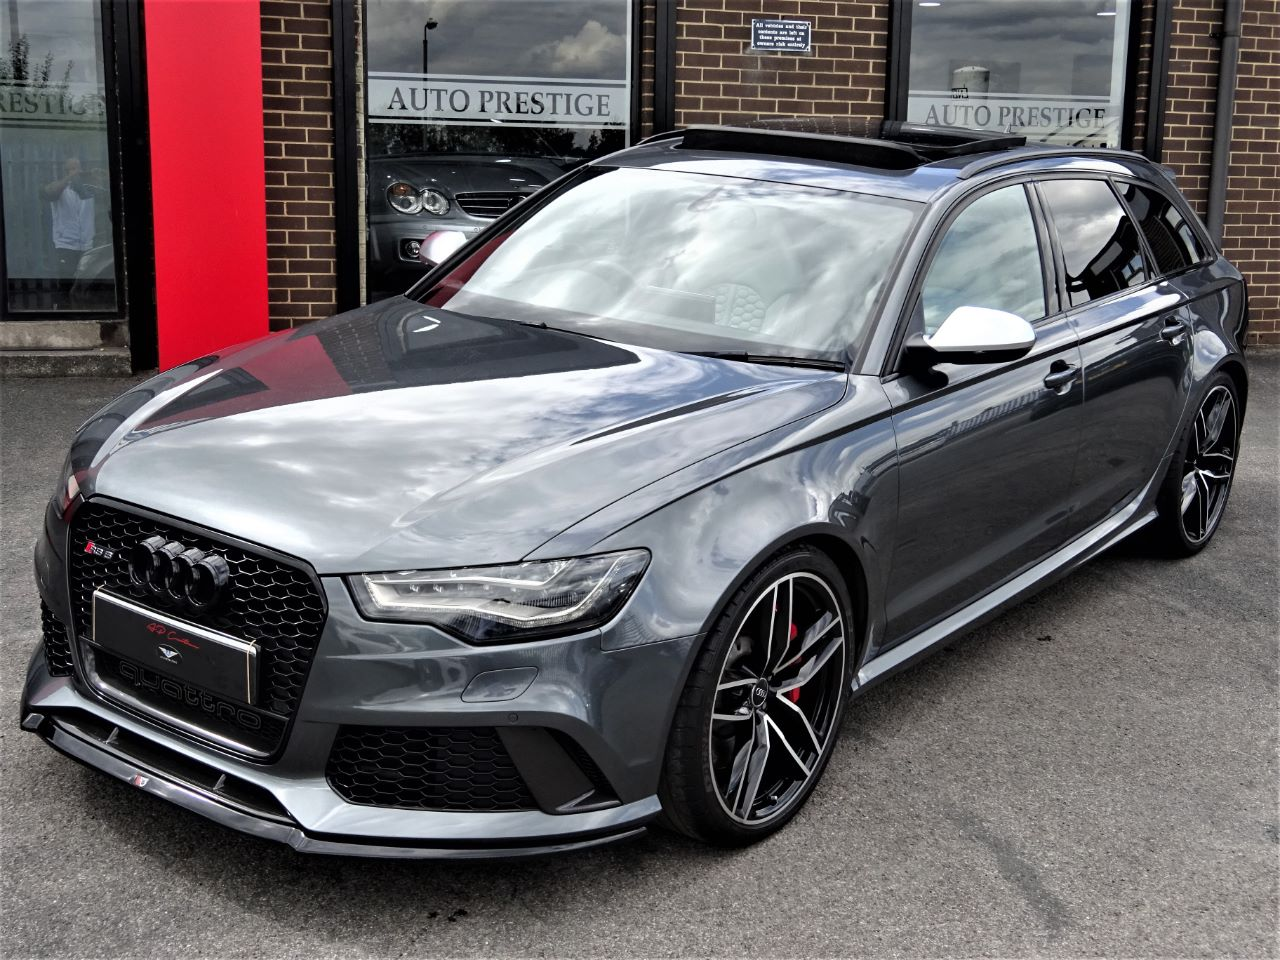 Audi Car Service Bradford